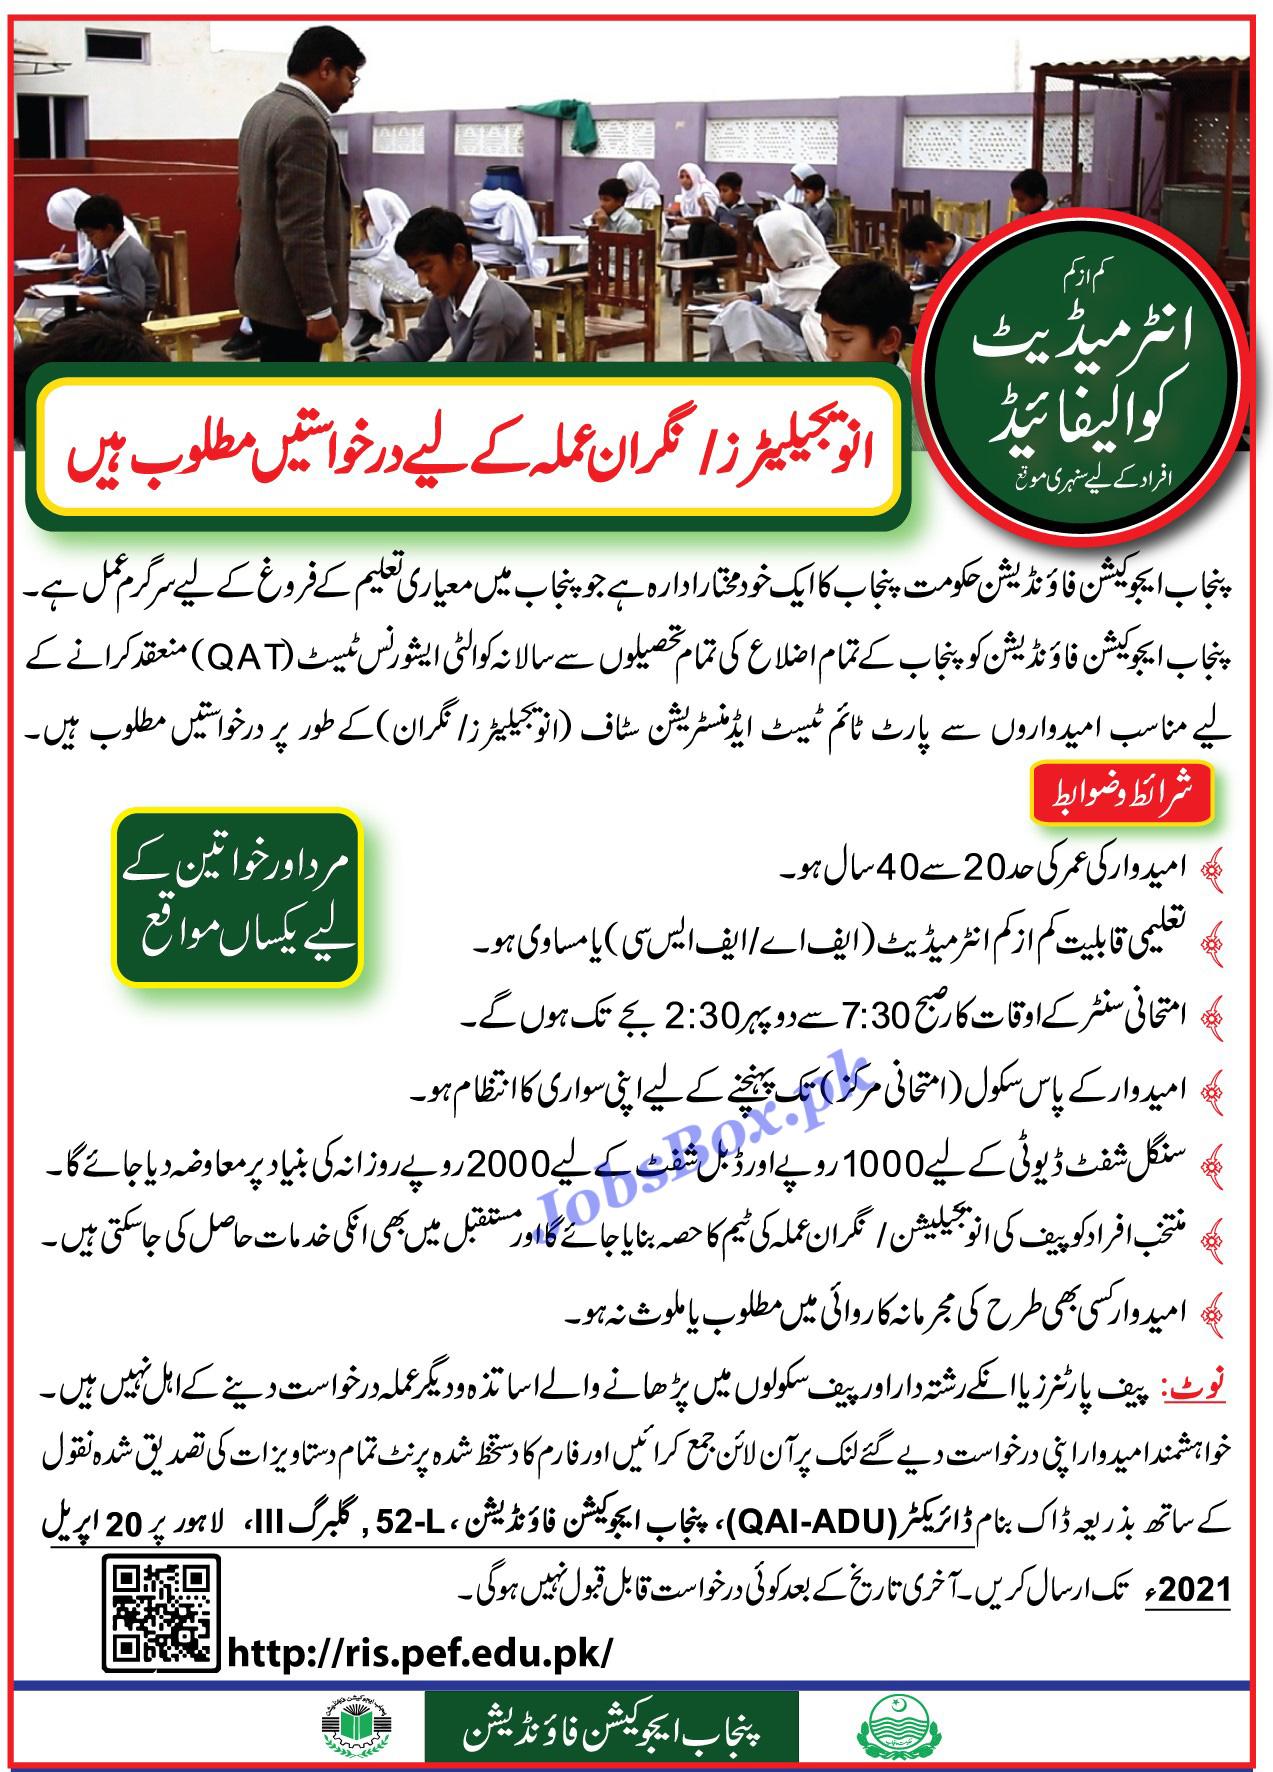 http://ris.pef.edu.pk/ - Punjab Education Foundation PEF Jobs 2021 - Invigilator Jobs 2021